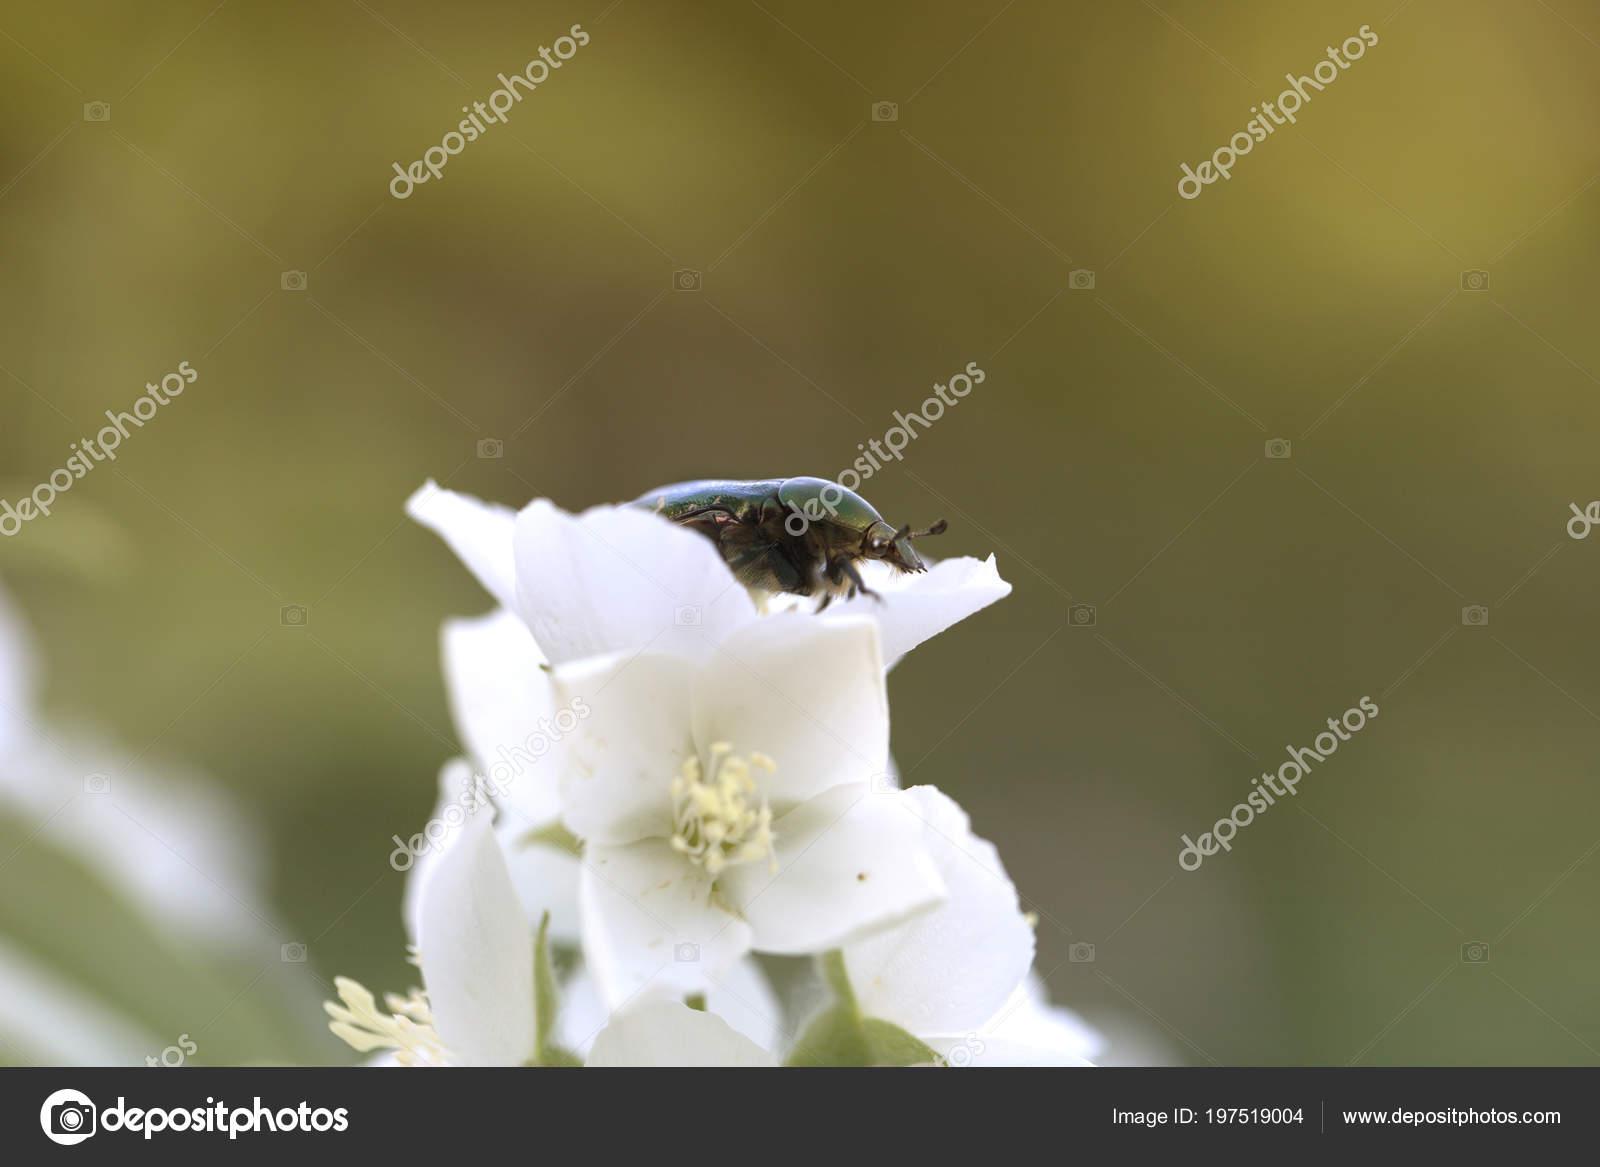 Chafer beetle jasmine flowers summer white garden jasmine bokeh chafer beetle jasmine flowers summer white garden jasmine bokeh white stock photo izmirmasajfo